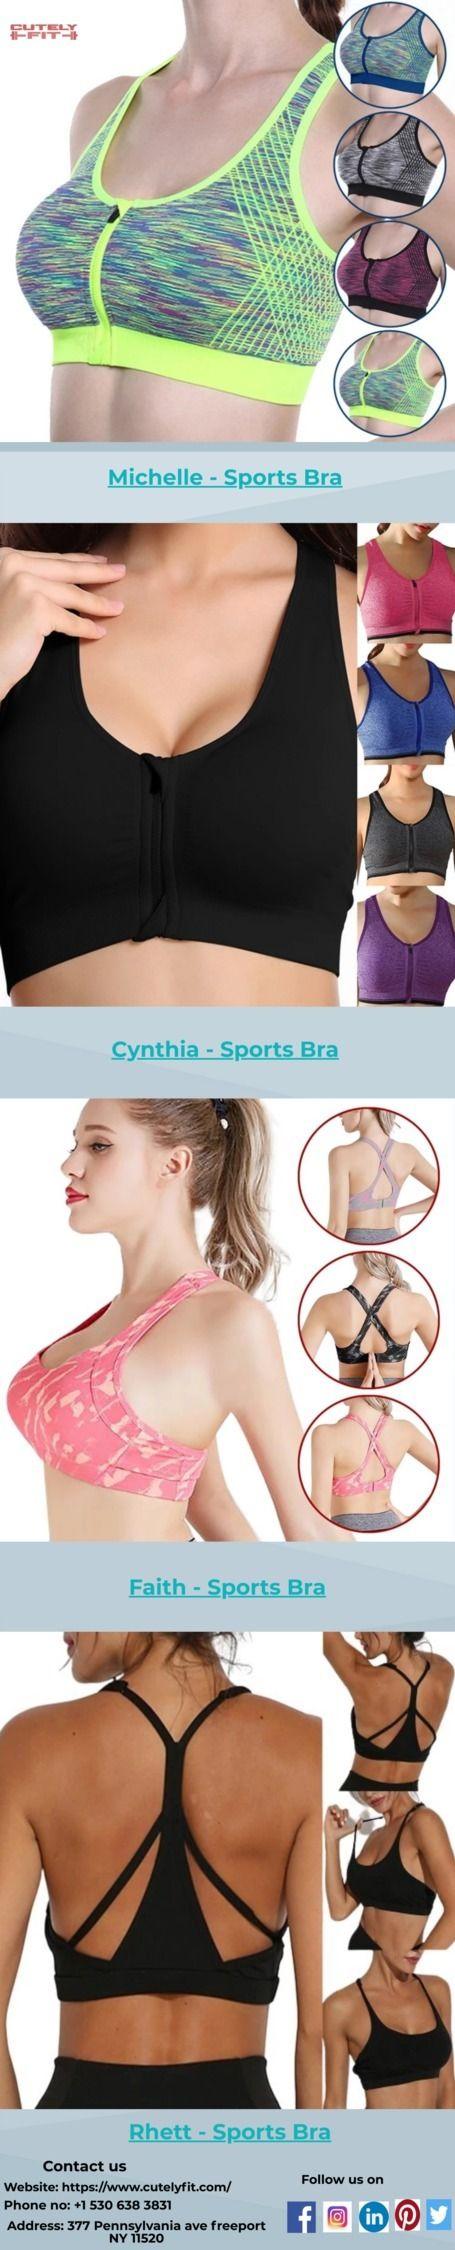 Buy Online Comfortable Sports B - cutelyfit | ello